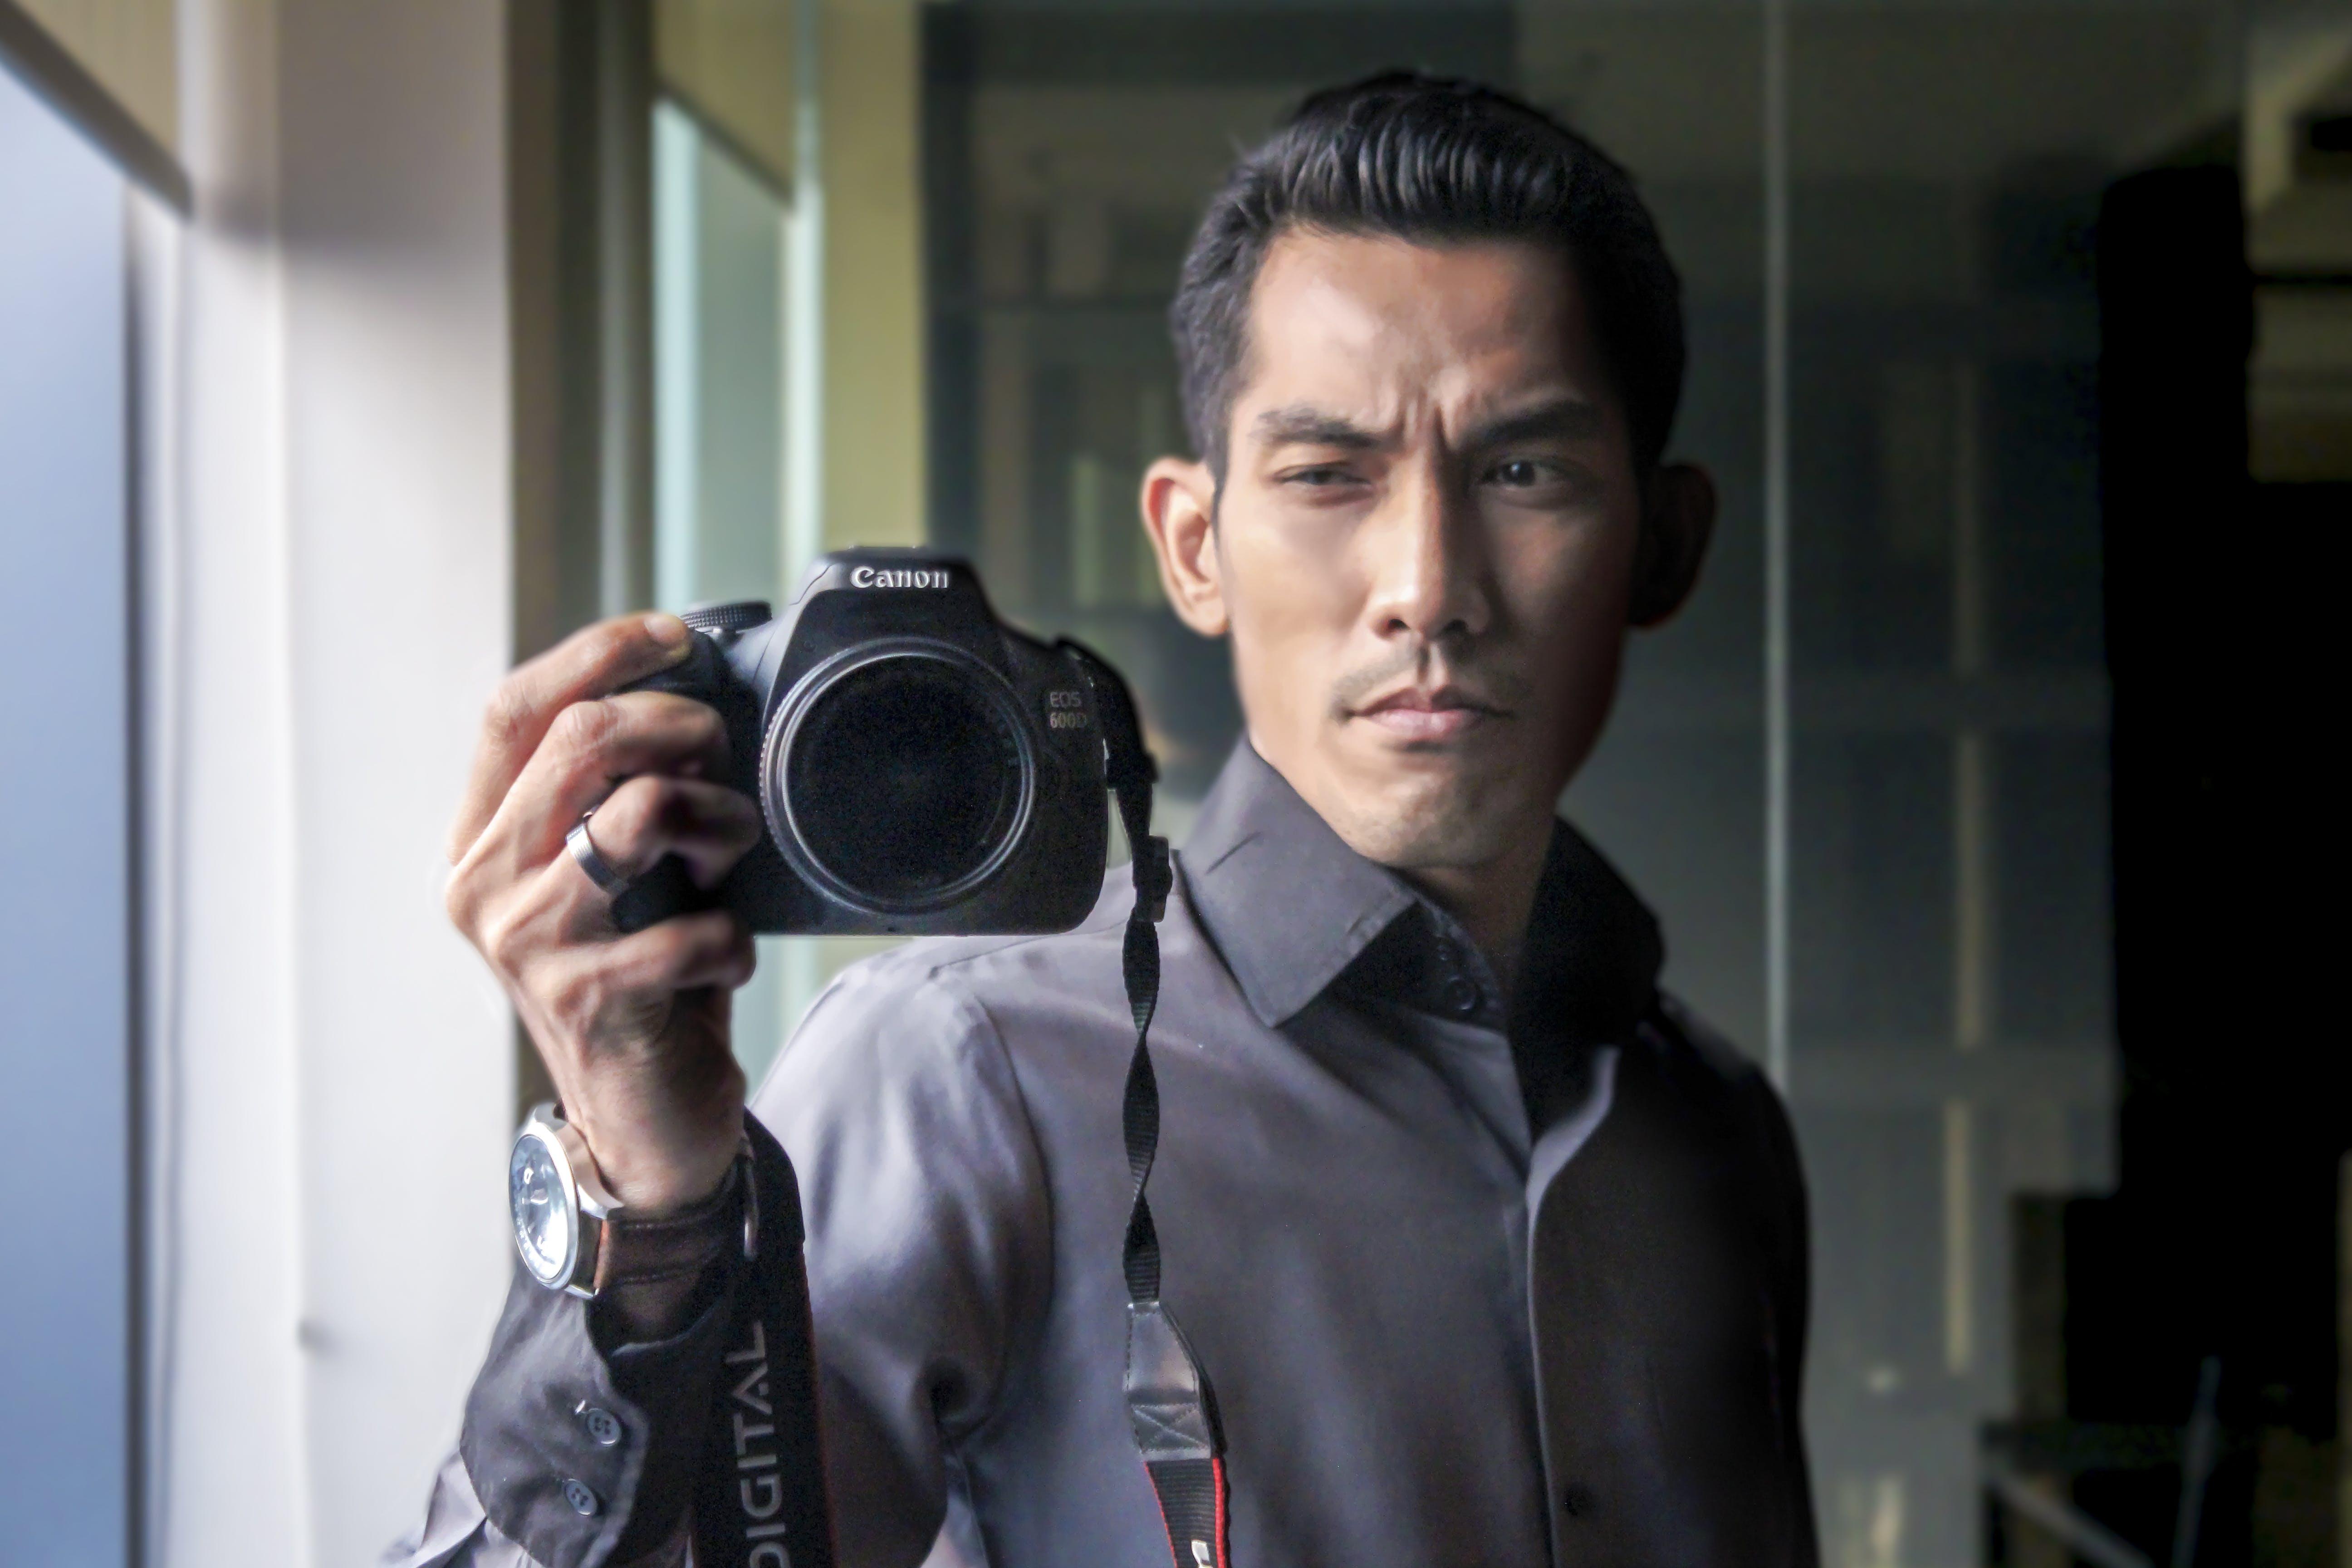 Free stock photo of #Canon, #Photography, #photo, #man